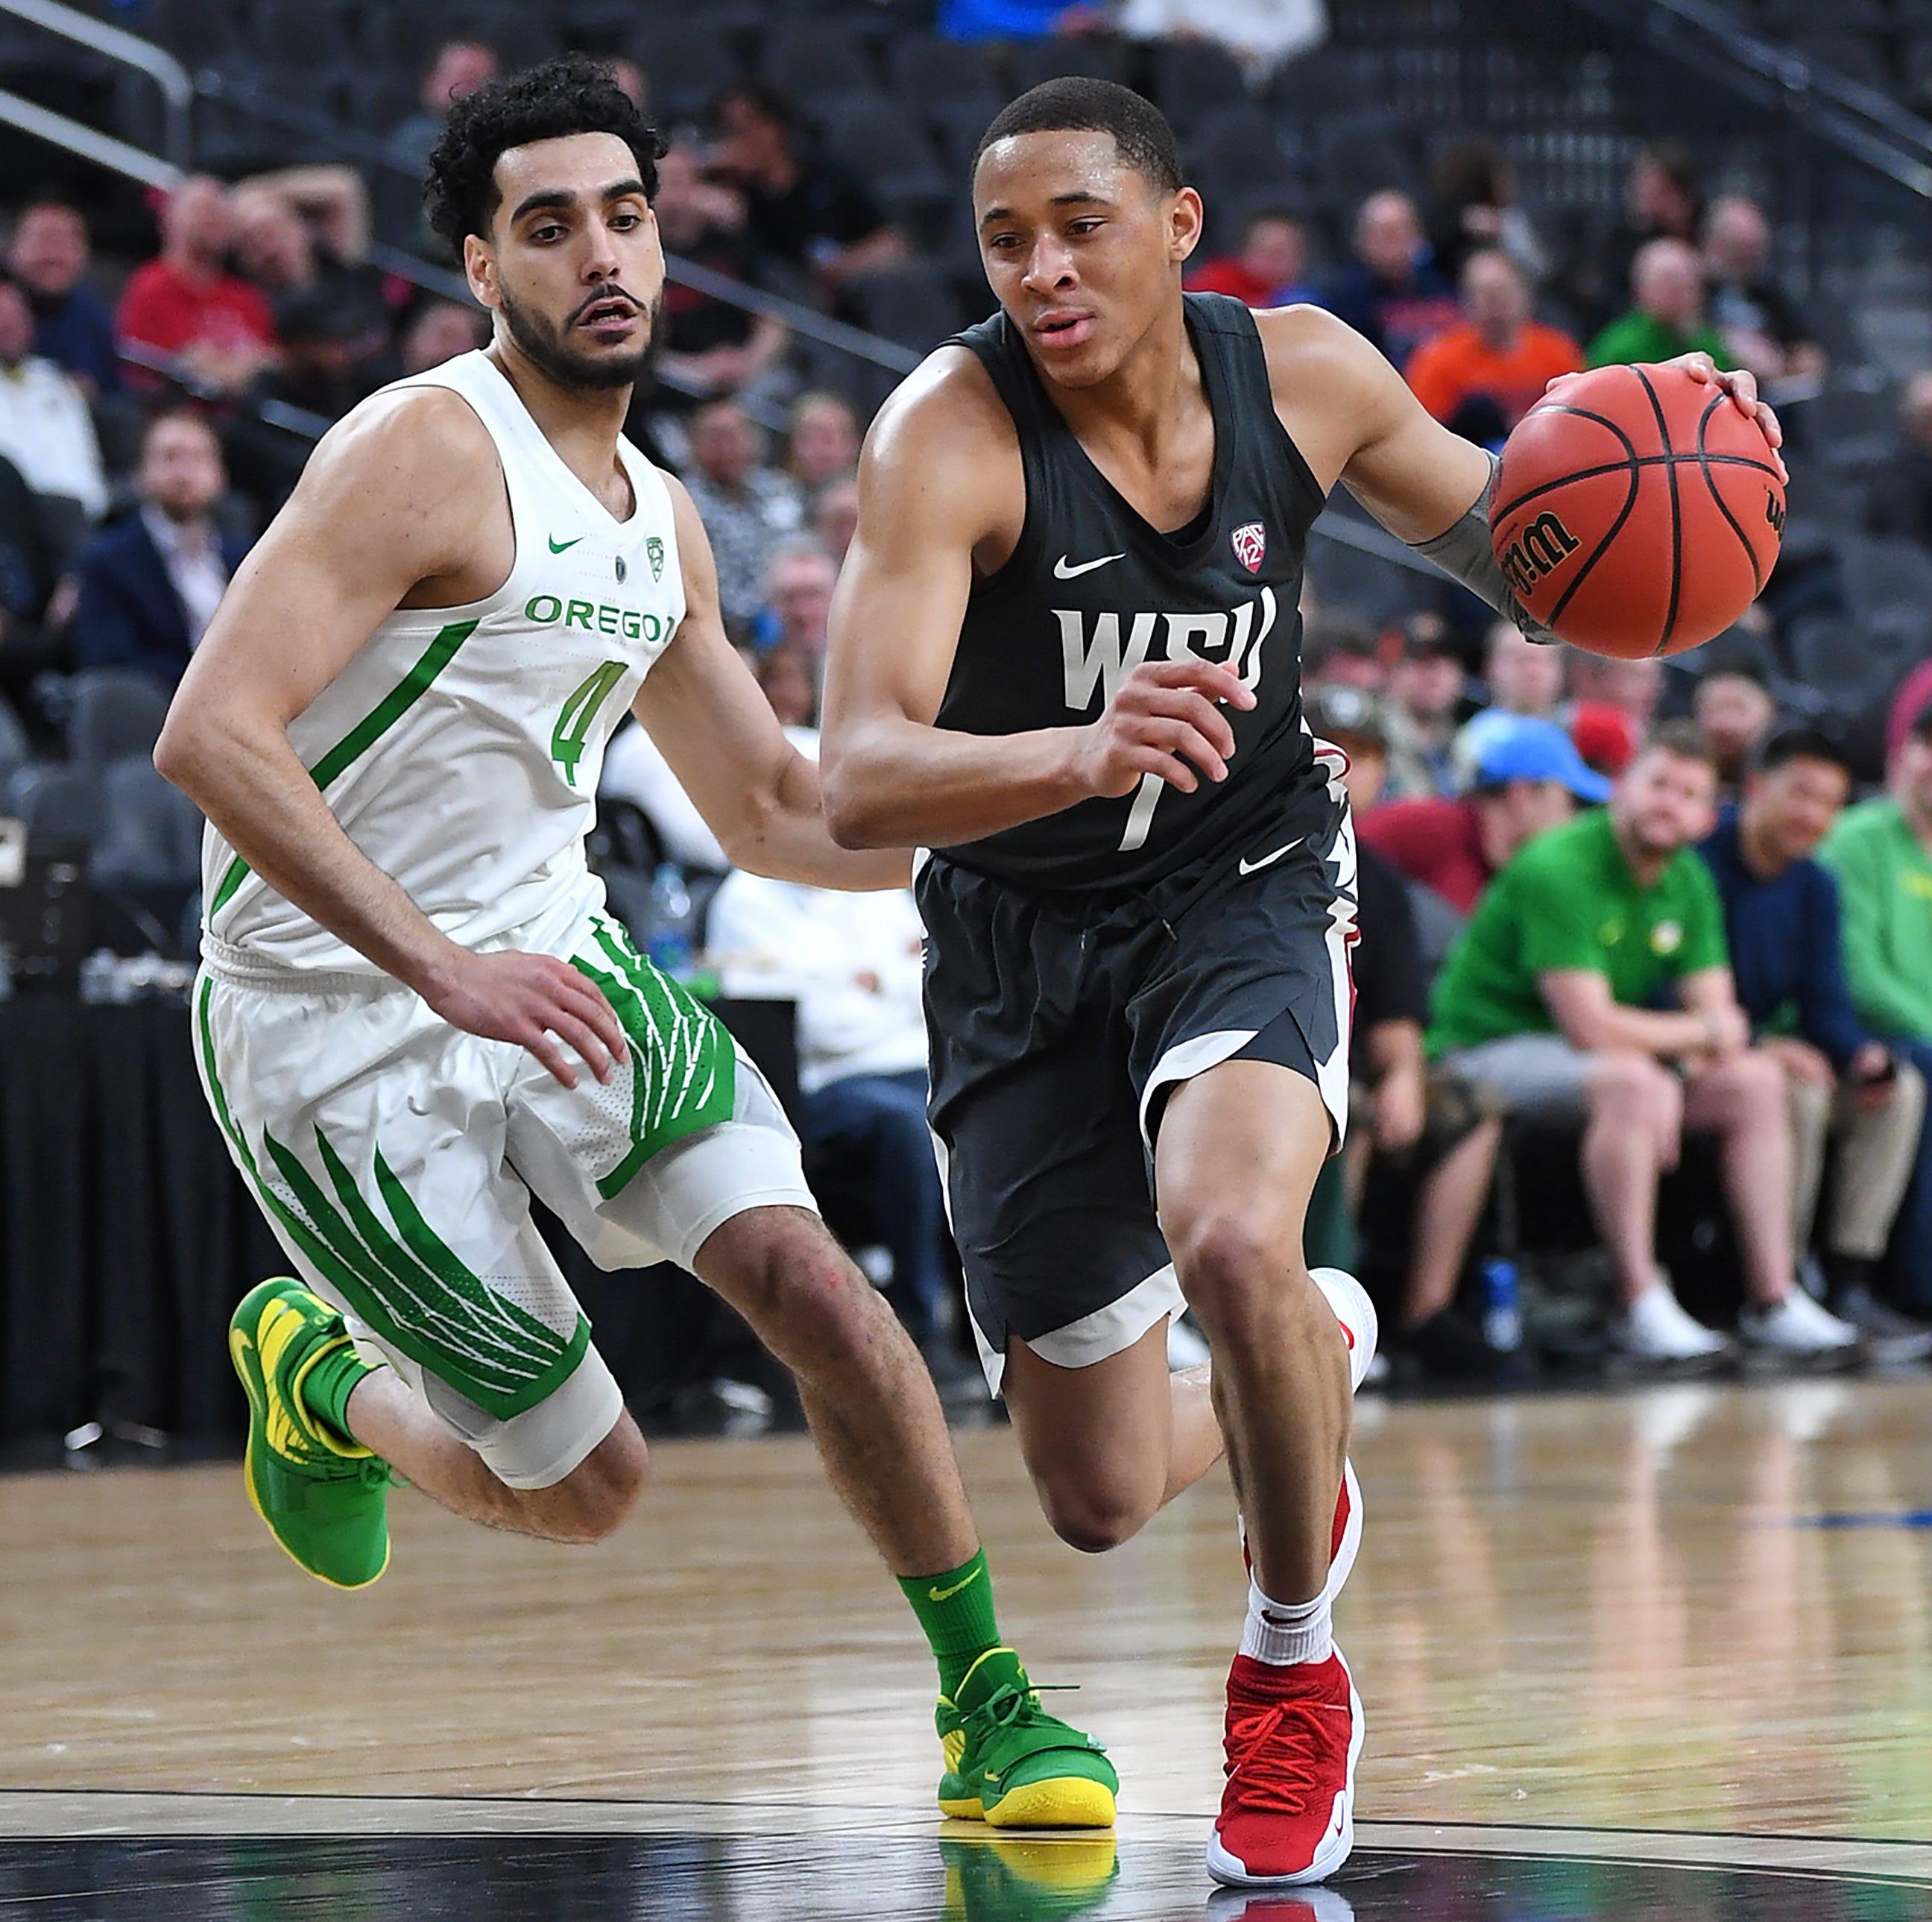 Ducks basketball: Oregon dominates Washington State 84-51 in Pac-12 opener